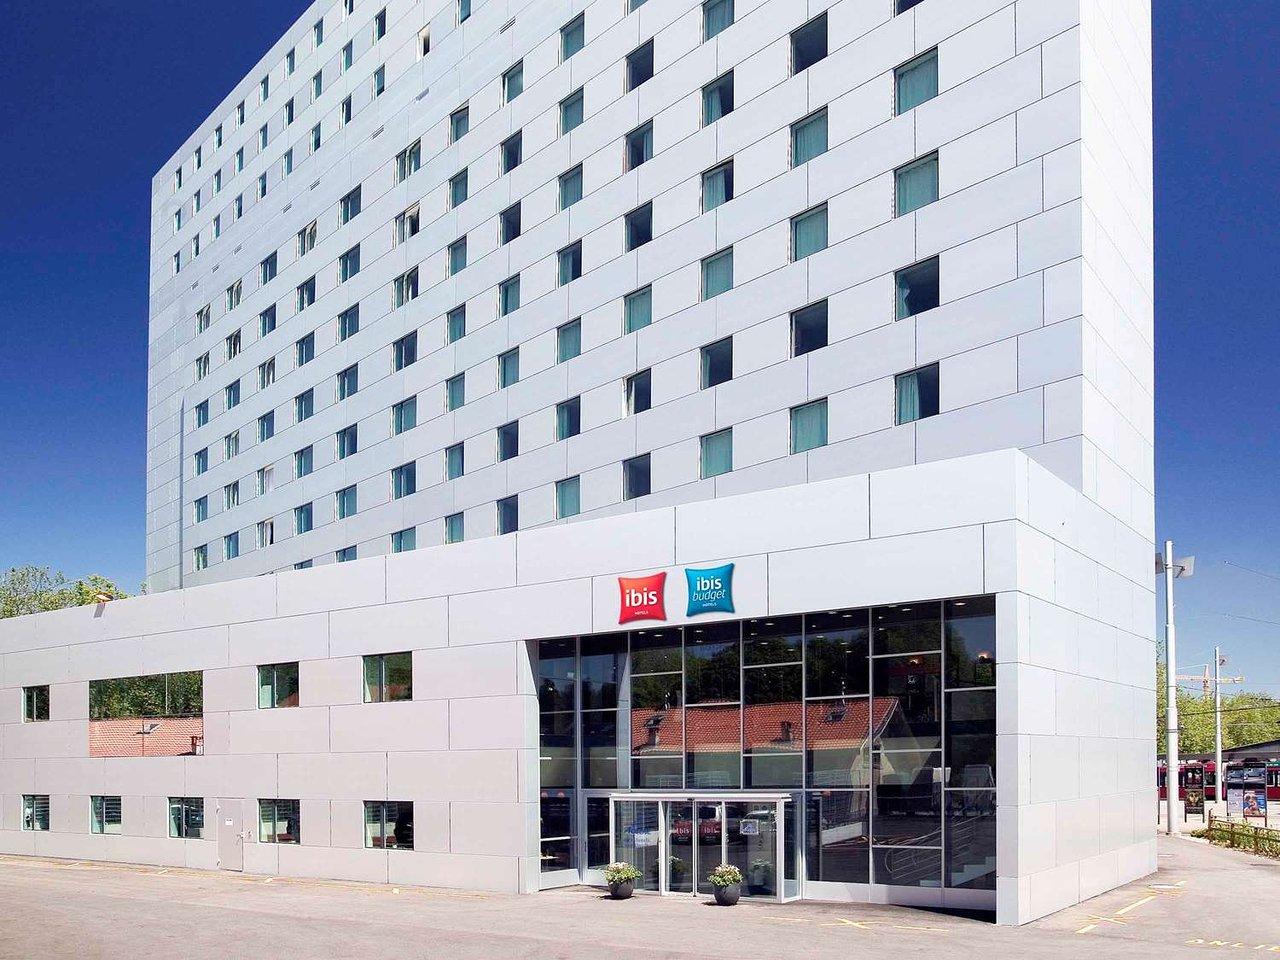 ibis budget bern expo 88 1 1 2 updated 2019 prices hotel rh tripadvisor com